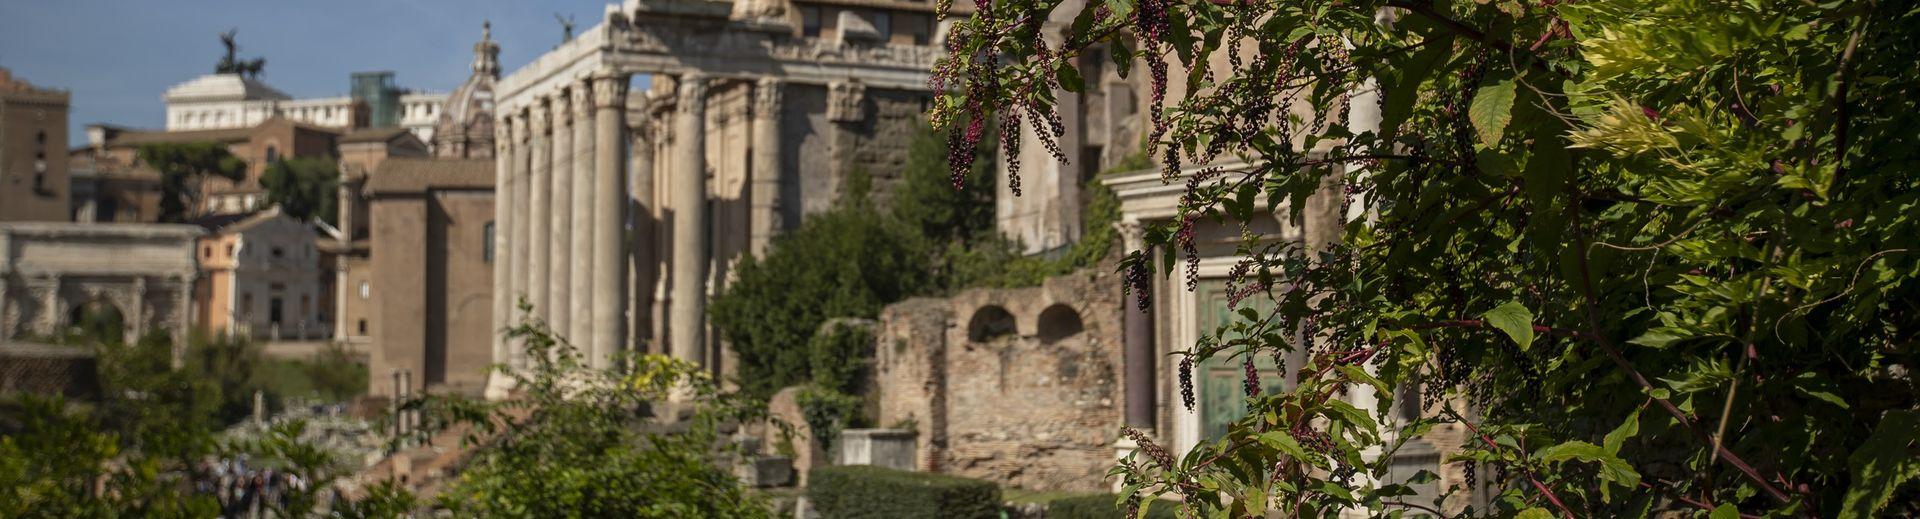 Temple University Rome campus historic buildings